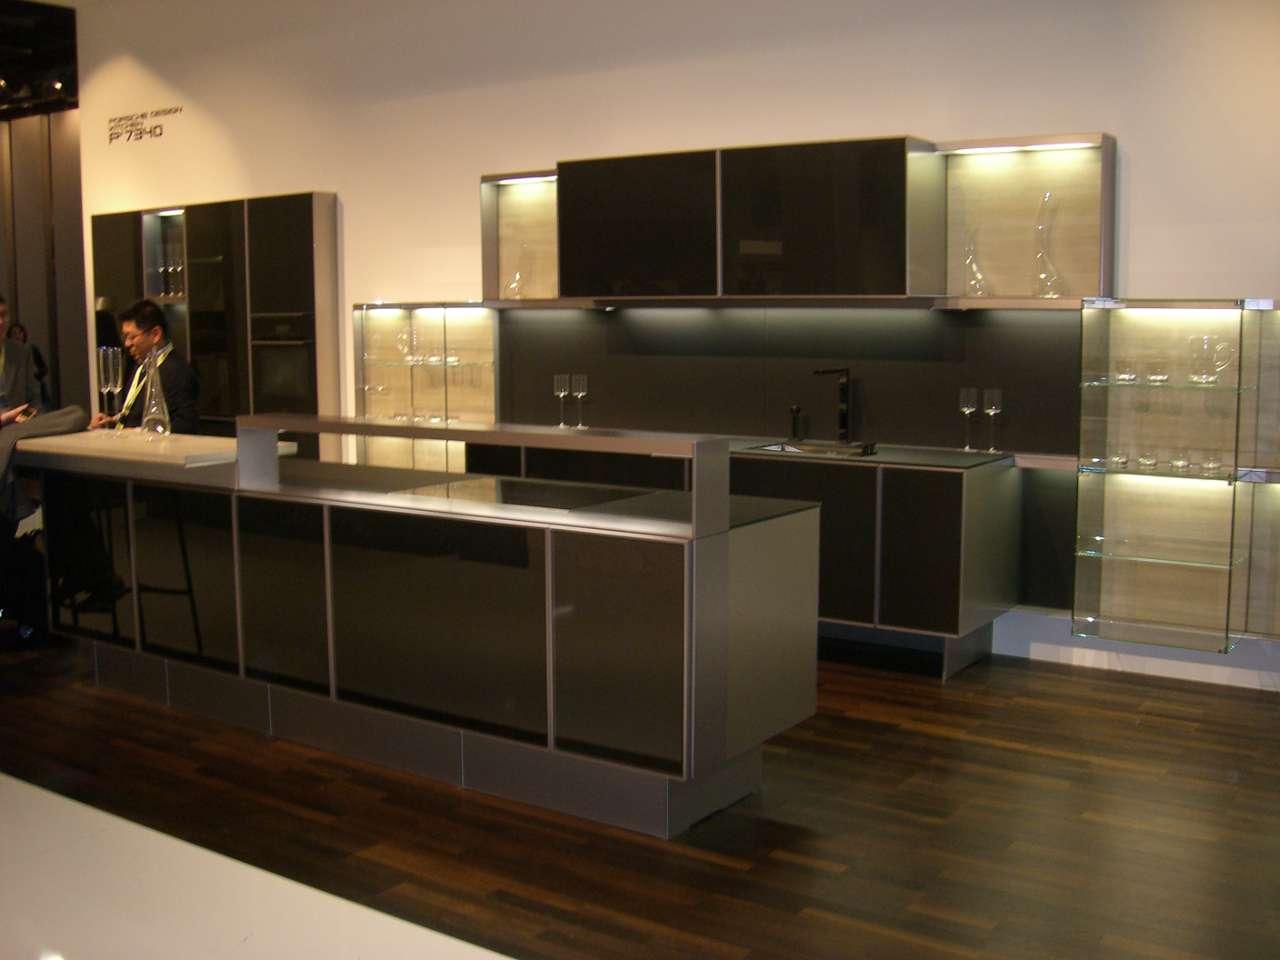 porsche design küche preis | p-13 chroma type 301